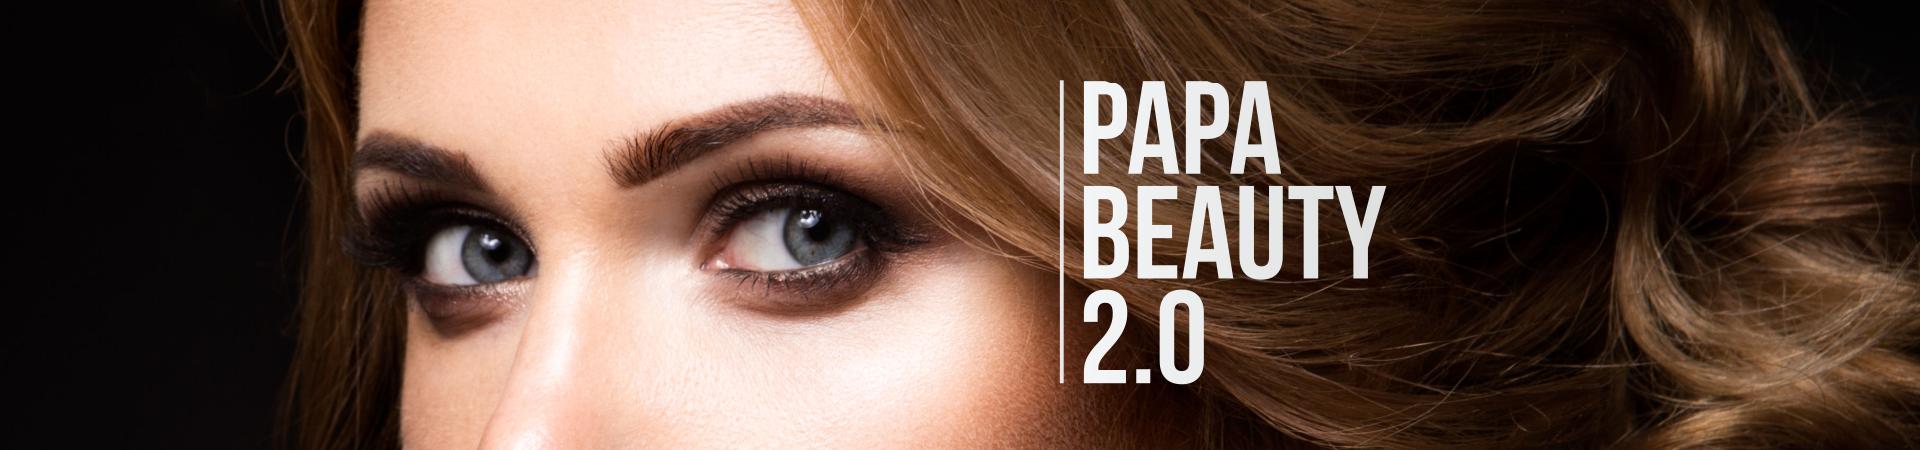 Papa Beauty 2.0, curso para profissionais da beleza, ministrado por Celso Martins Junior e outros profissionais do mercado profissional. Grandha Professional Hair Care e Academia Brasileira de Tricologia.